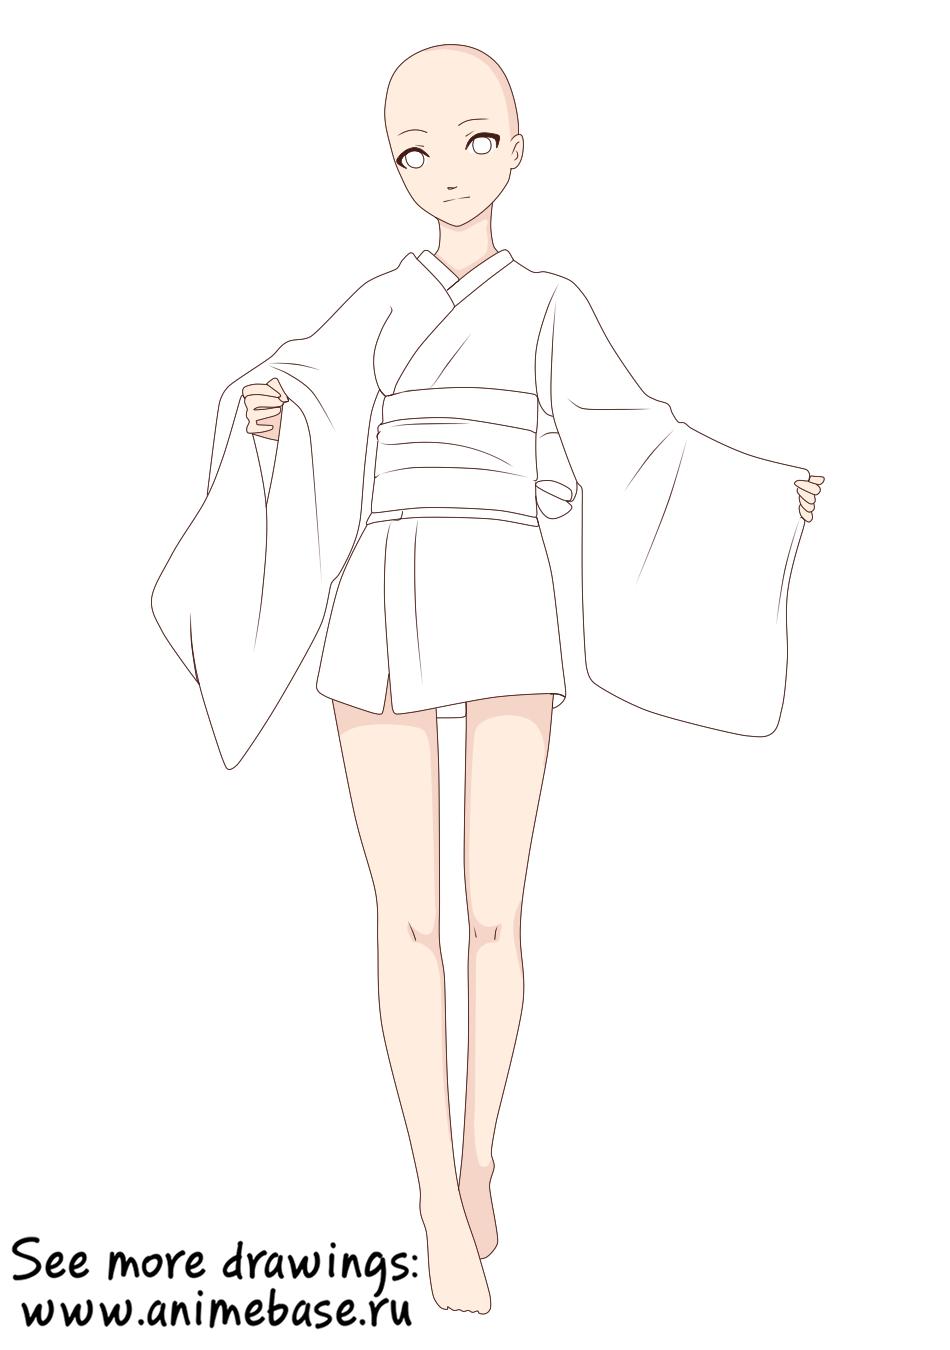 Yukata (Short kimono) — Юката (Короткое кимоно) аниме манекен в одежде clothes anime base ych pose